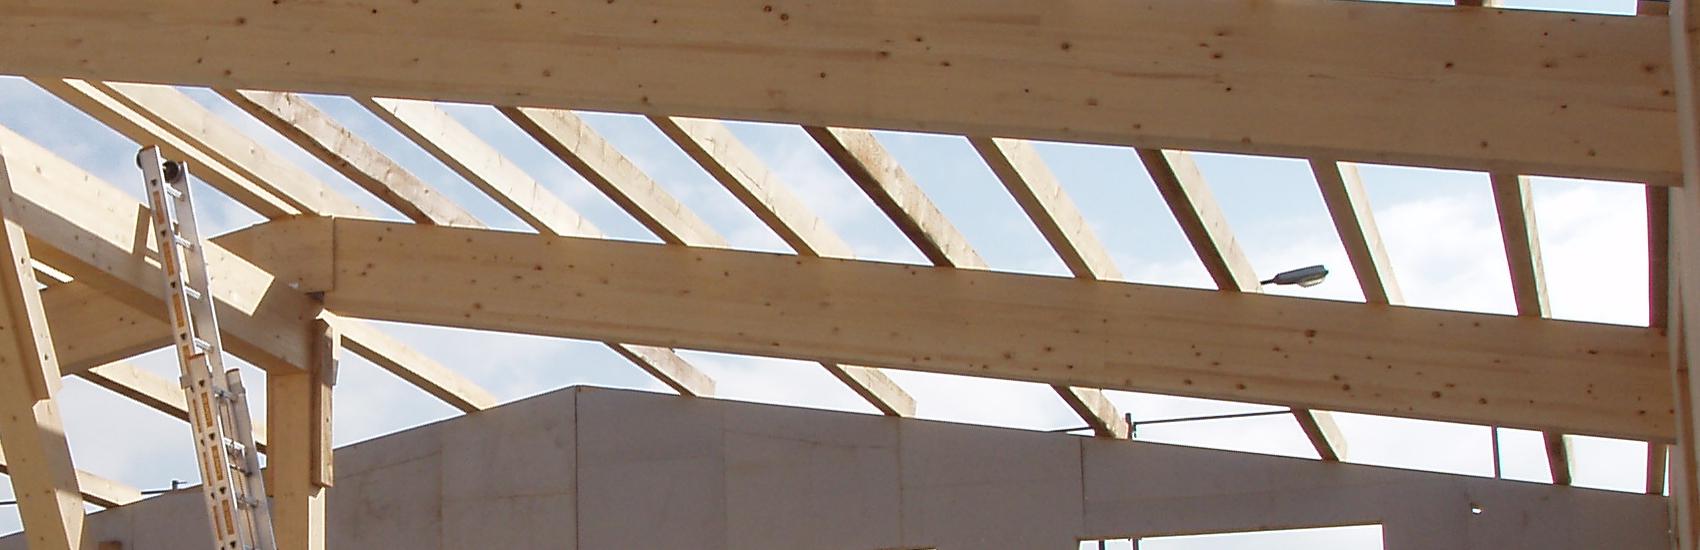 Hallenbau Dachkonstruktion